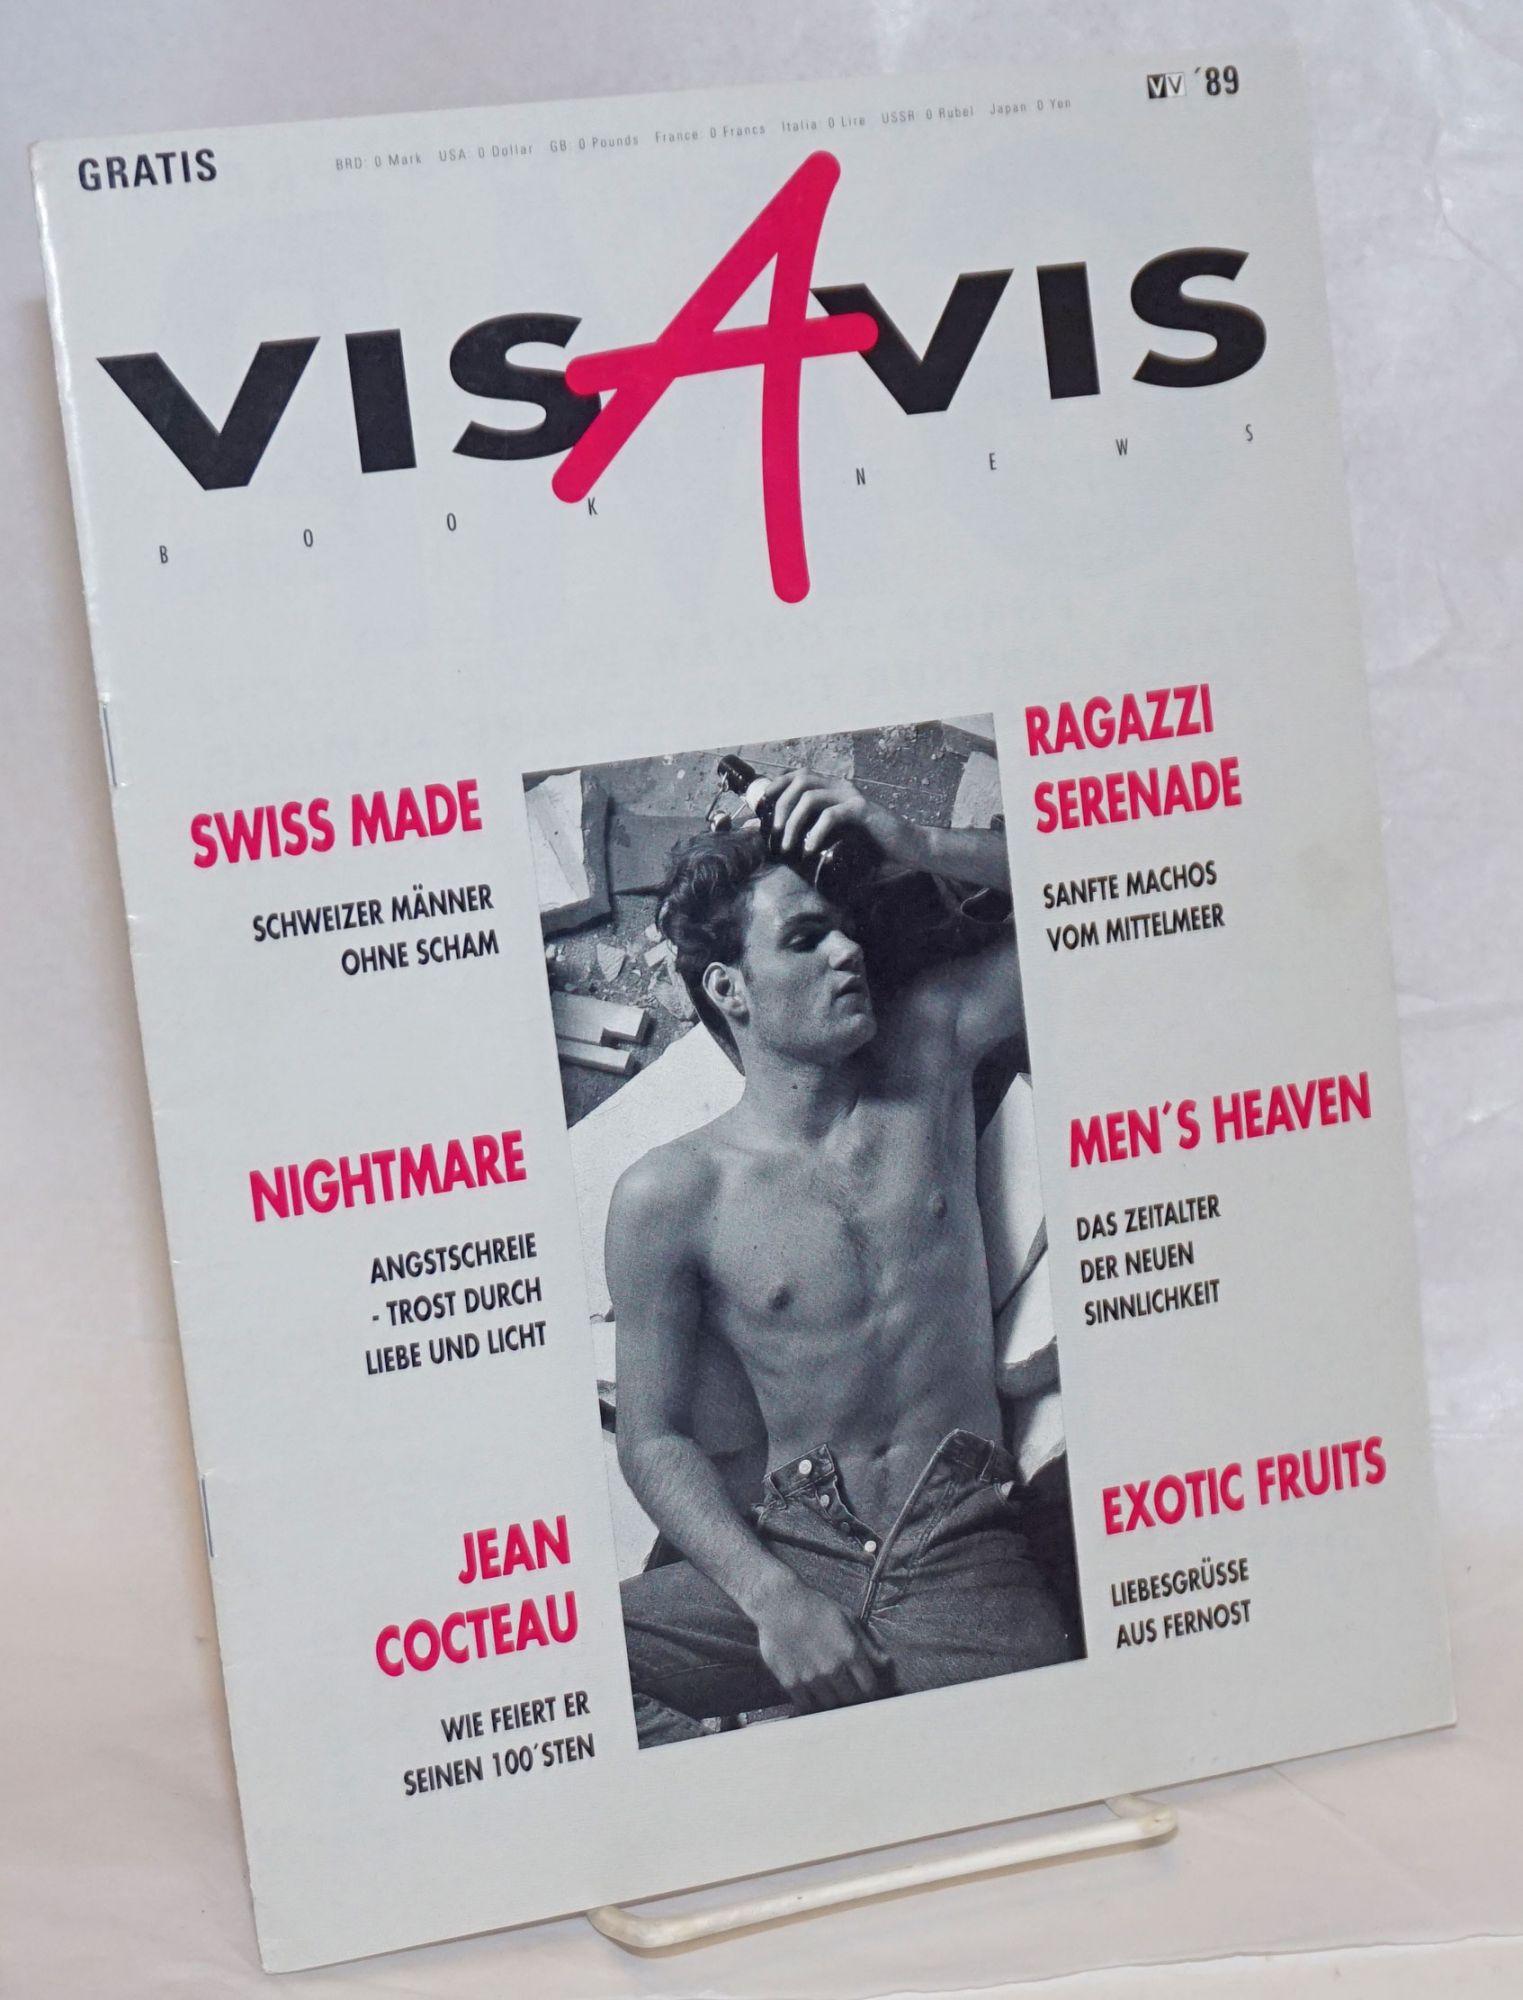 Vis-a-Vis BookNews #1